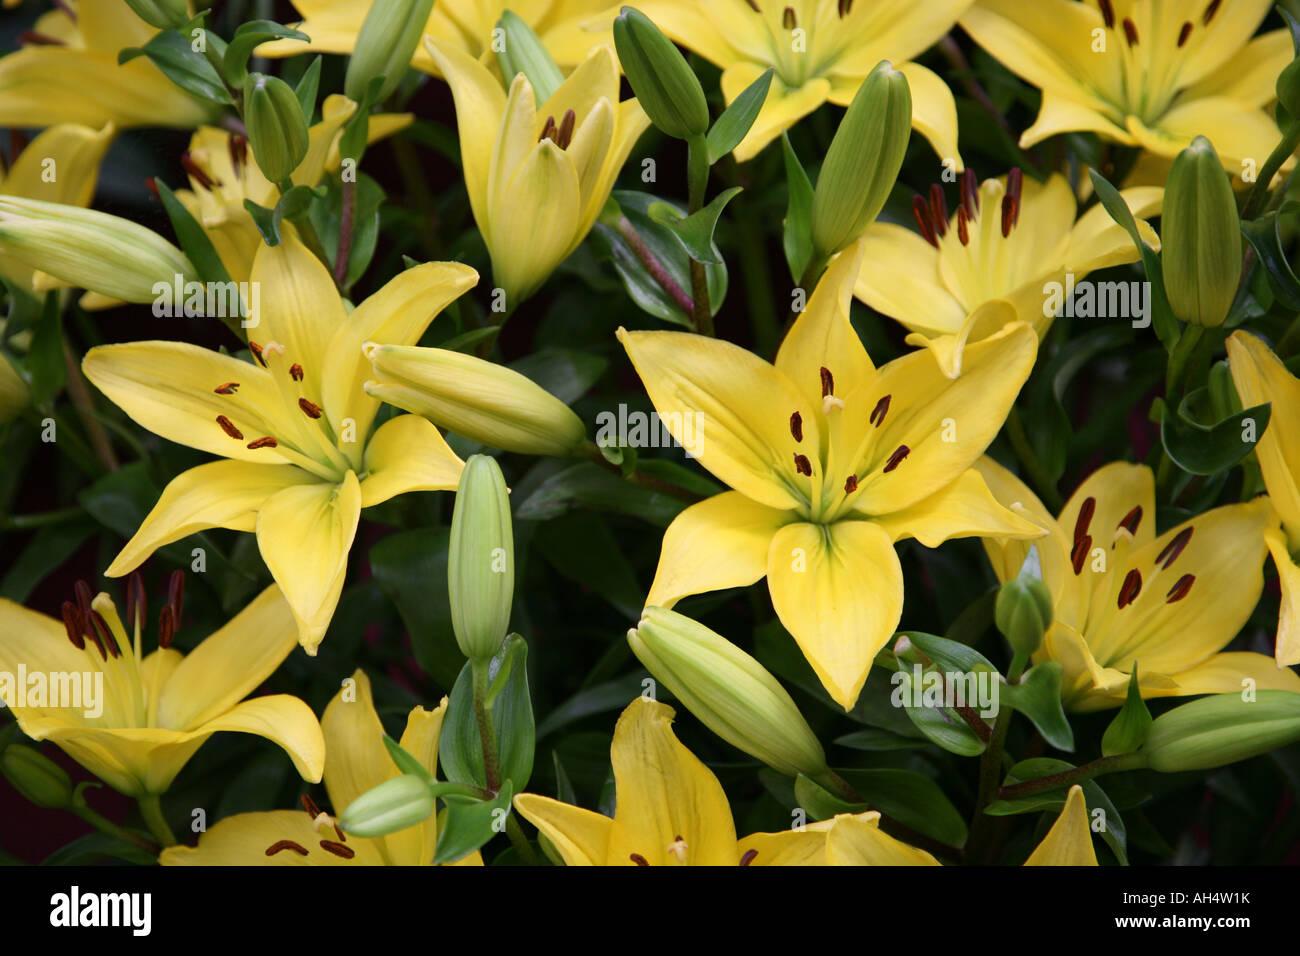 Image of yellow lilies taken at the Malvern Autumn Show 2007 - Stock Image